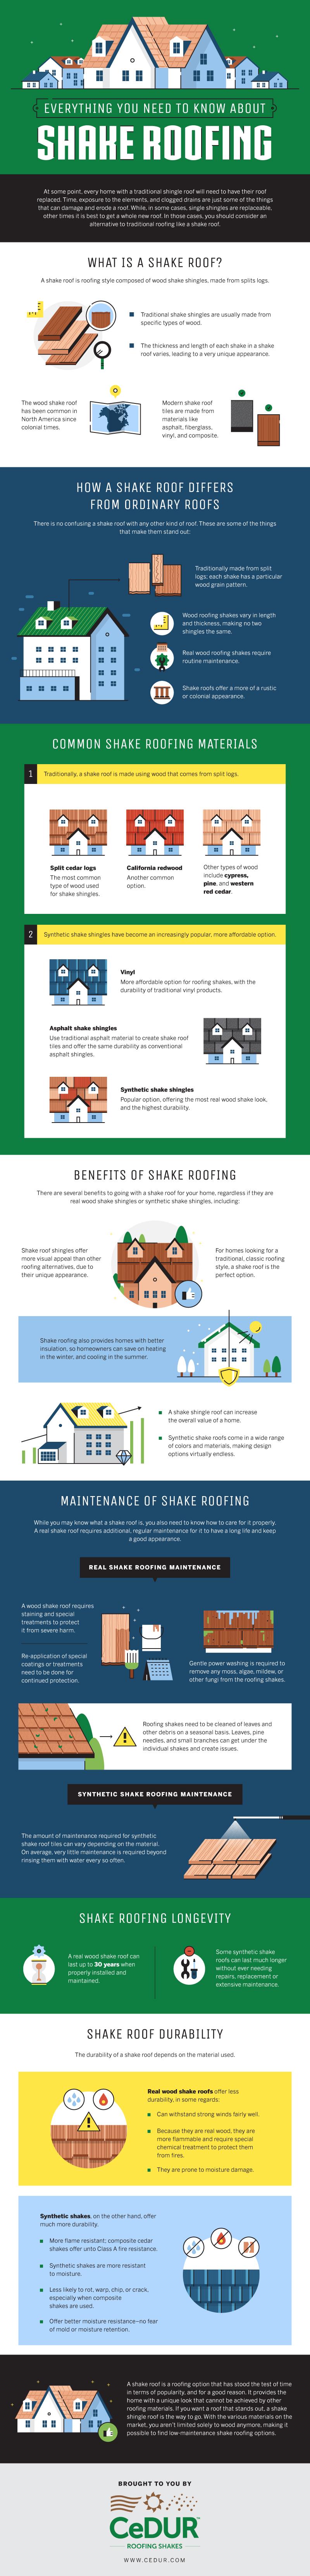 infographic-shake-roofing-1705.jpg